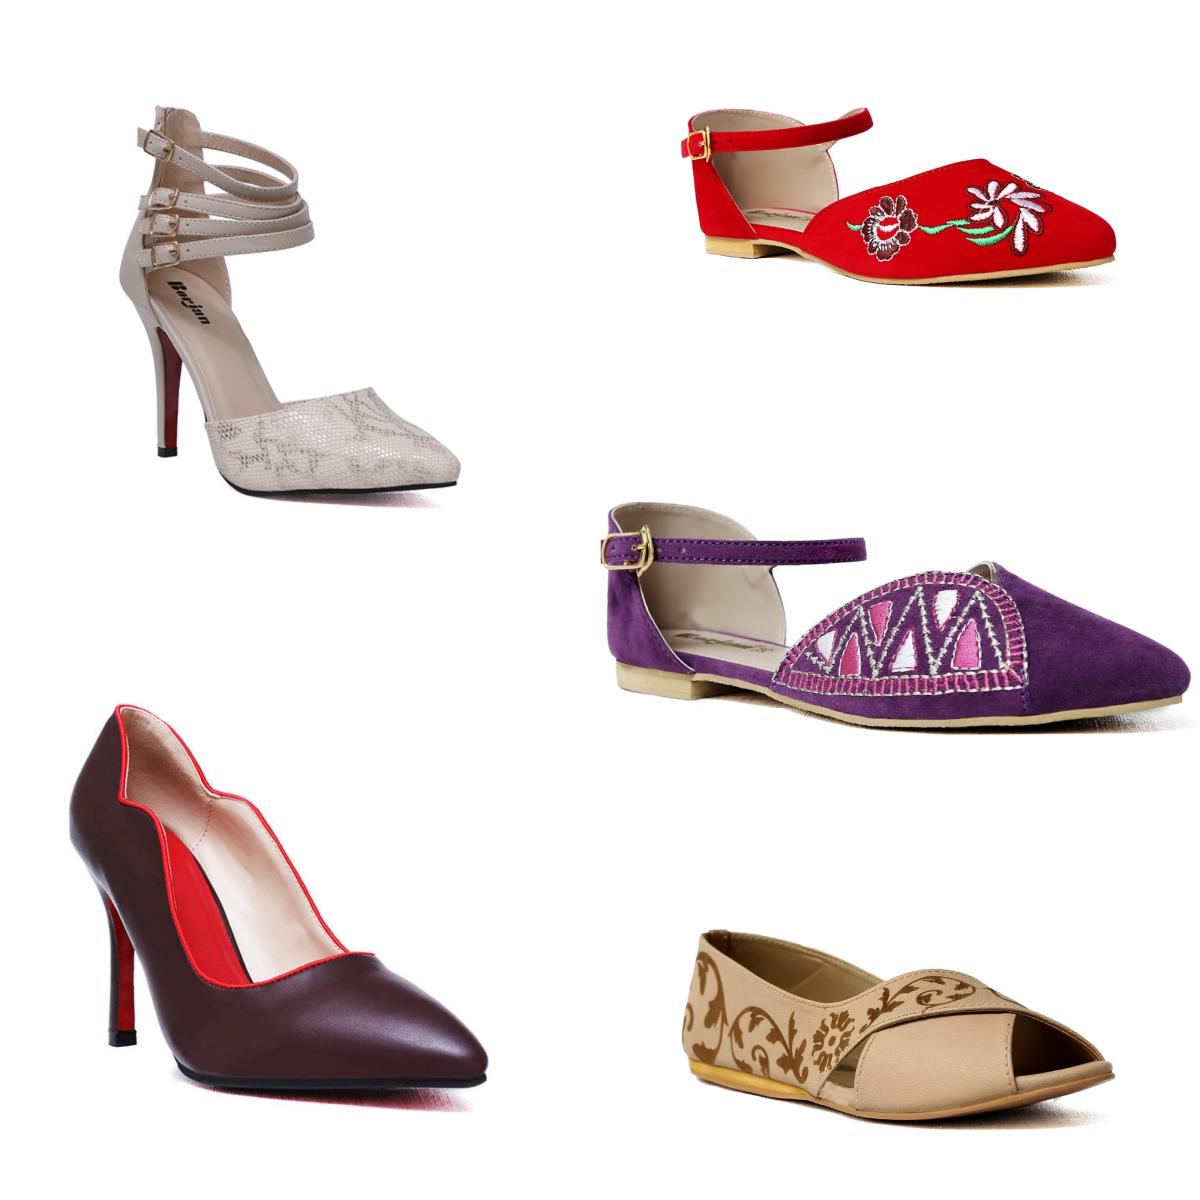 f7c88afdb894 BORJAN SHOES LATEST FALL WINTER FOOTWEAR DESIGNS 2016-17 FOR WOMEN